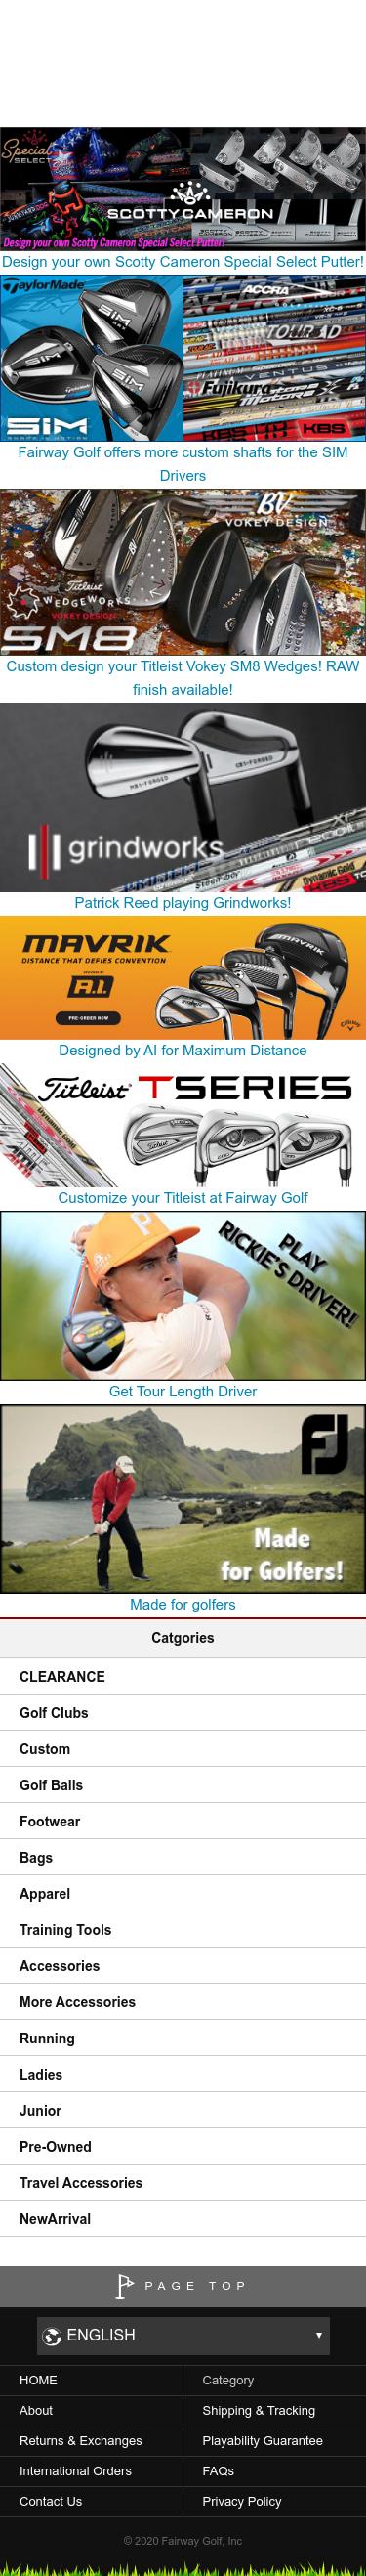 Fairway Golf Coupon